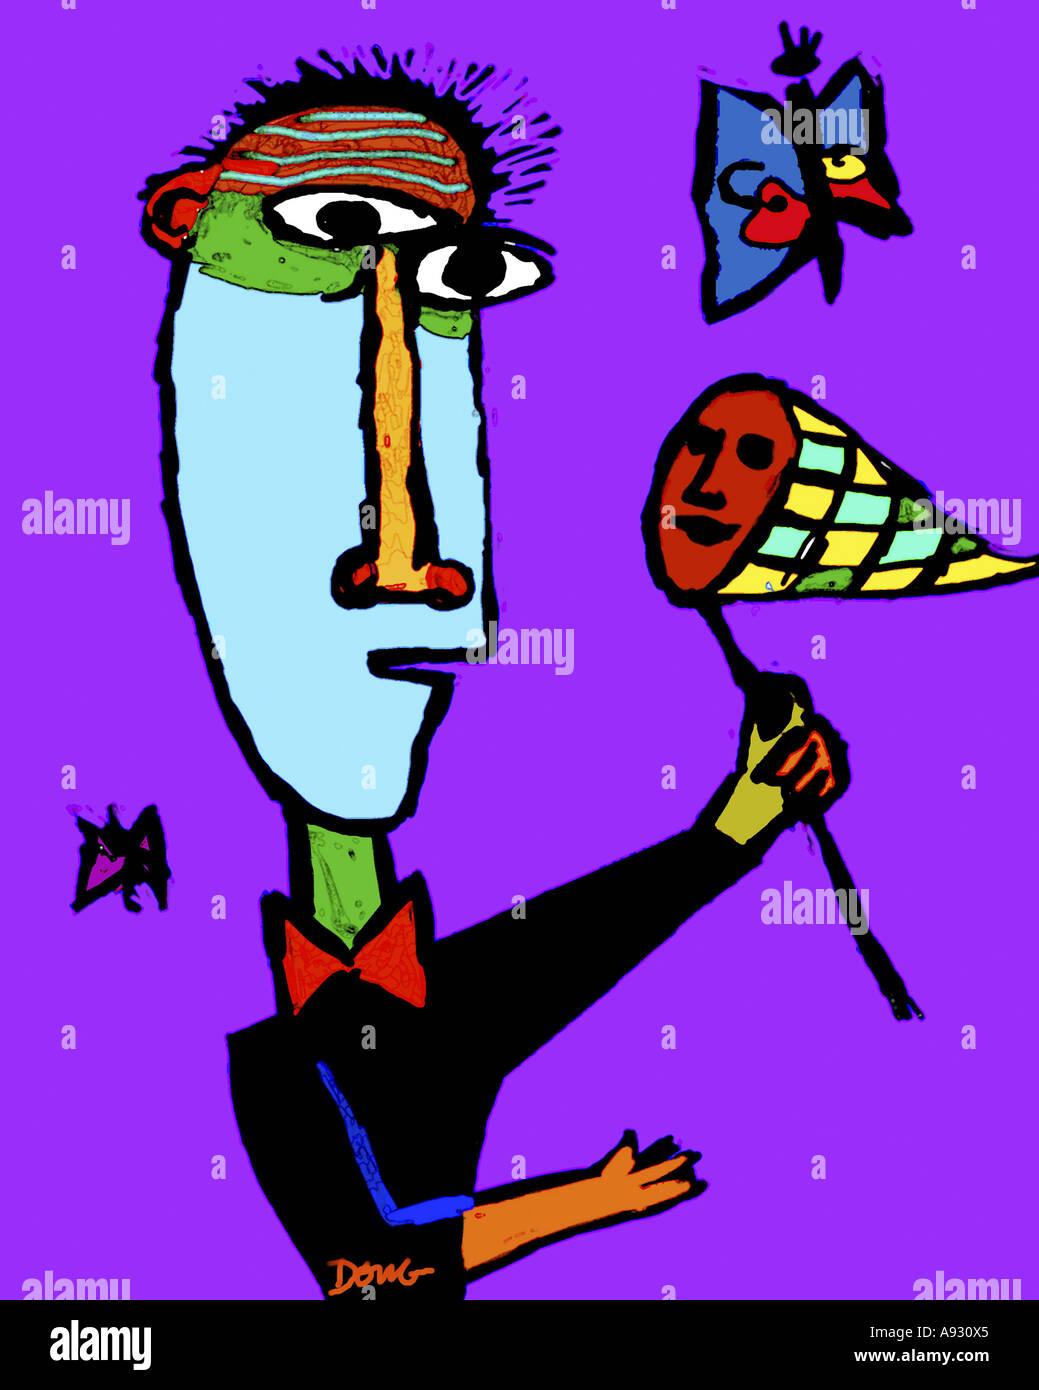 Butterfly Catcher 2001 Diana Ongs (b.1940/cino-americano) Computer grafica Immagini Stock